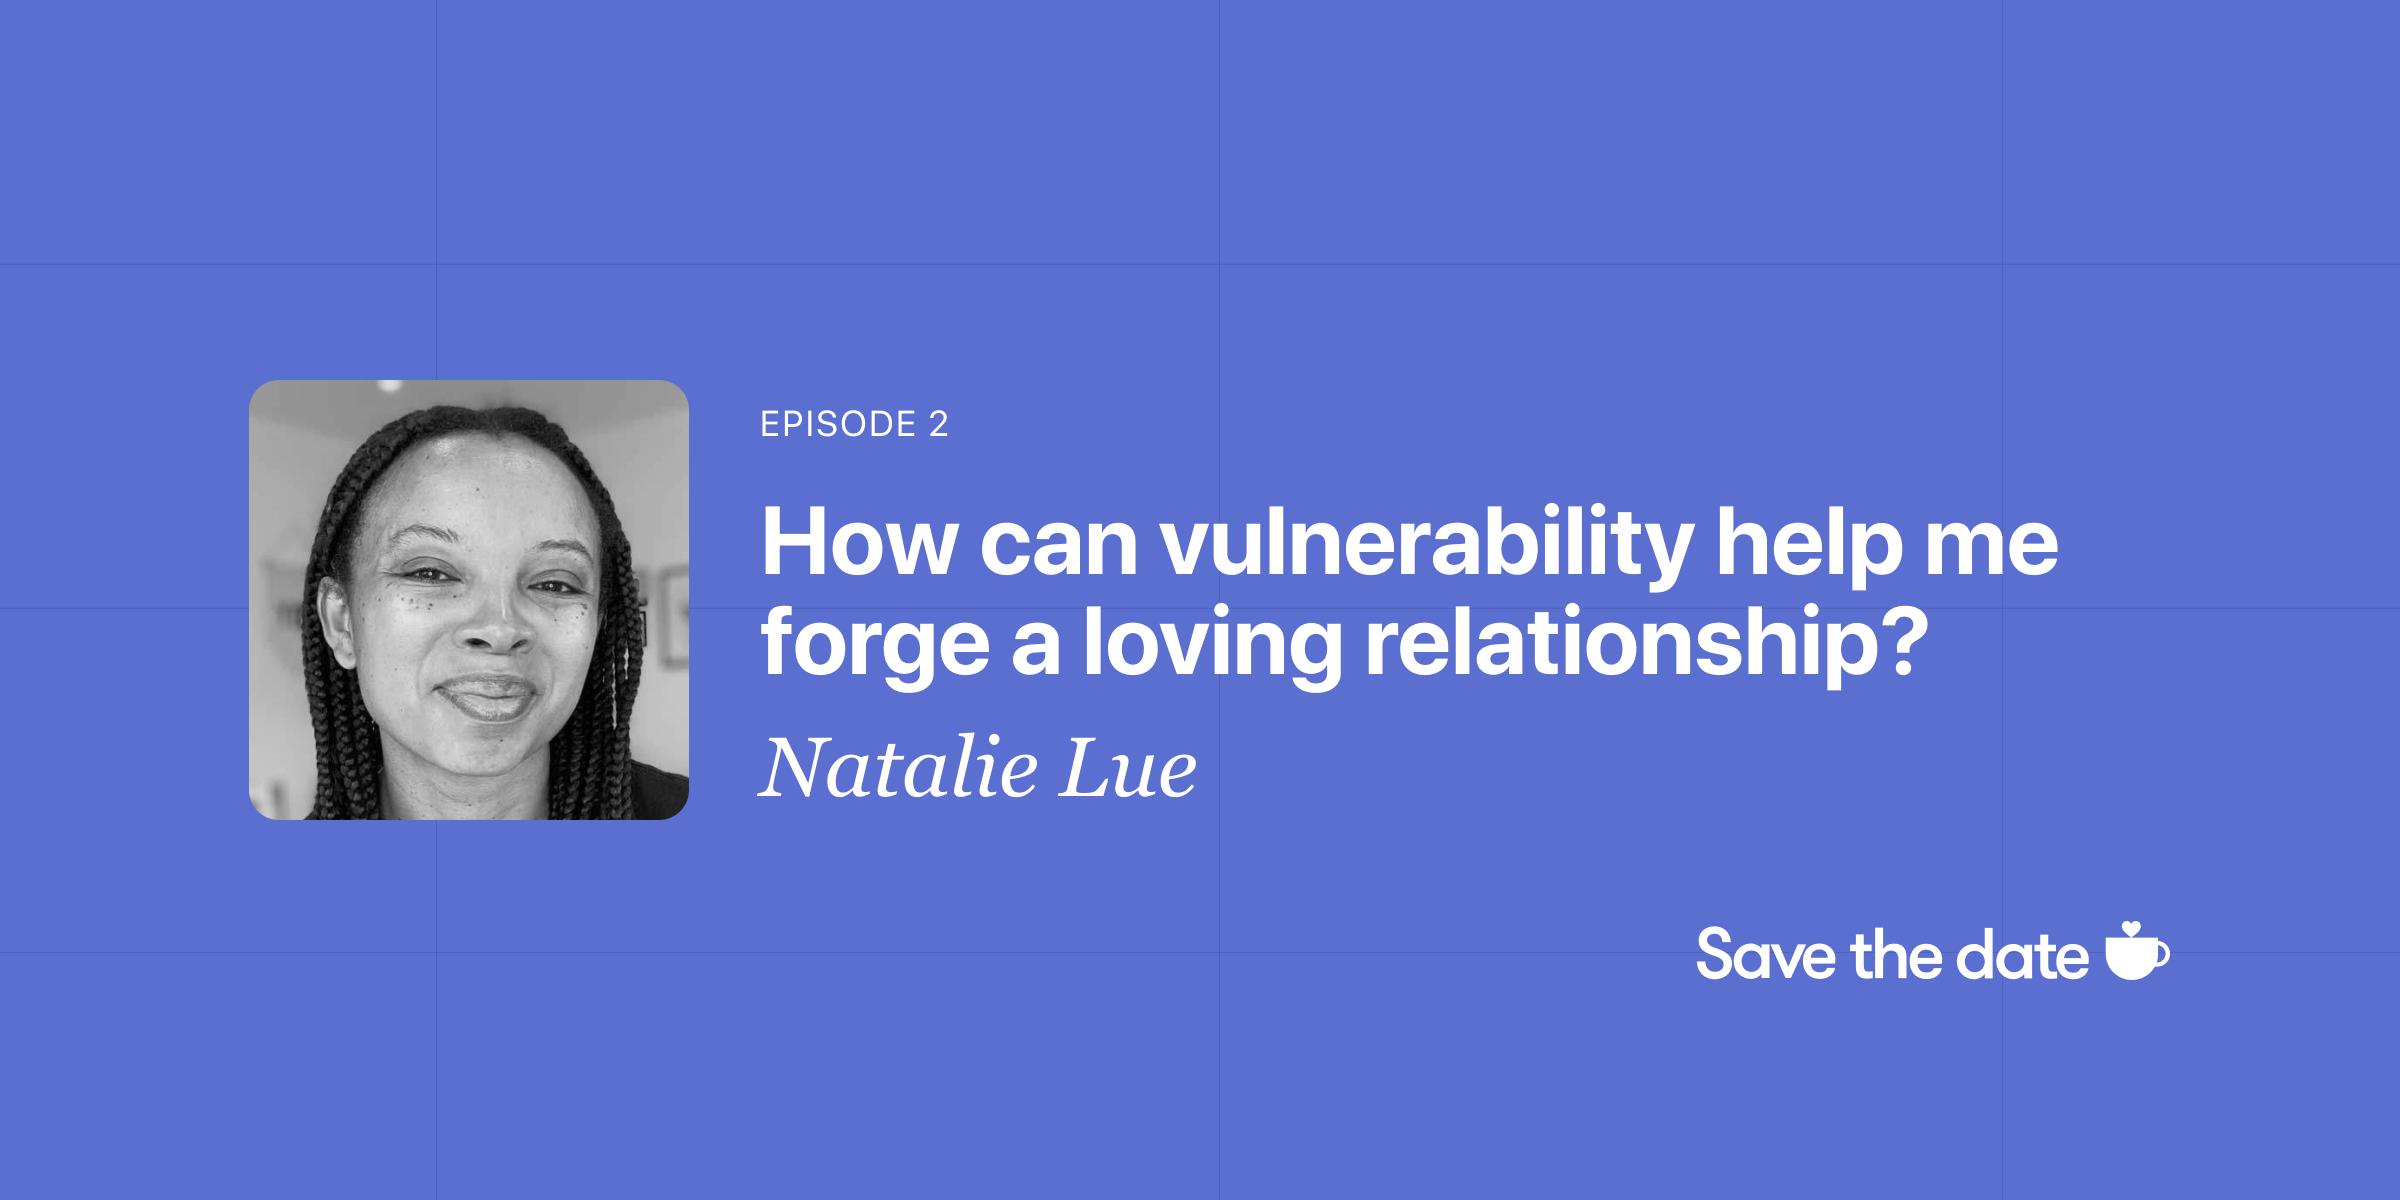 Natalie Lue, Episode 2